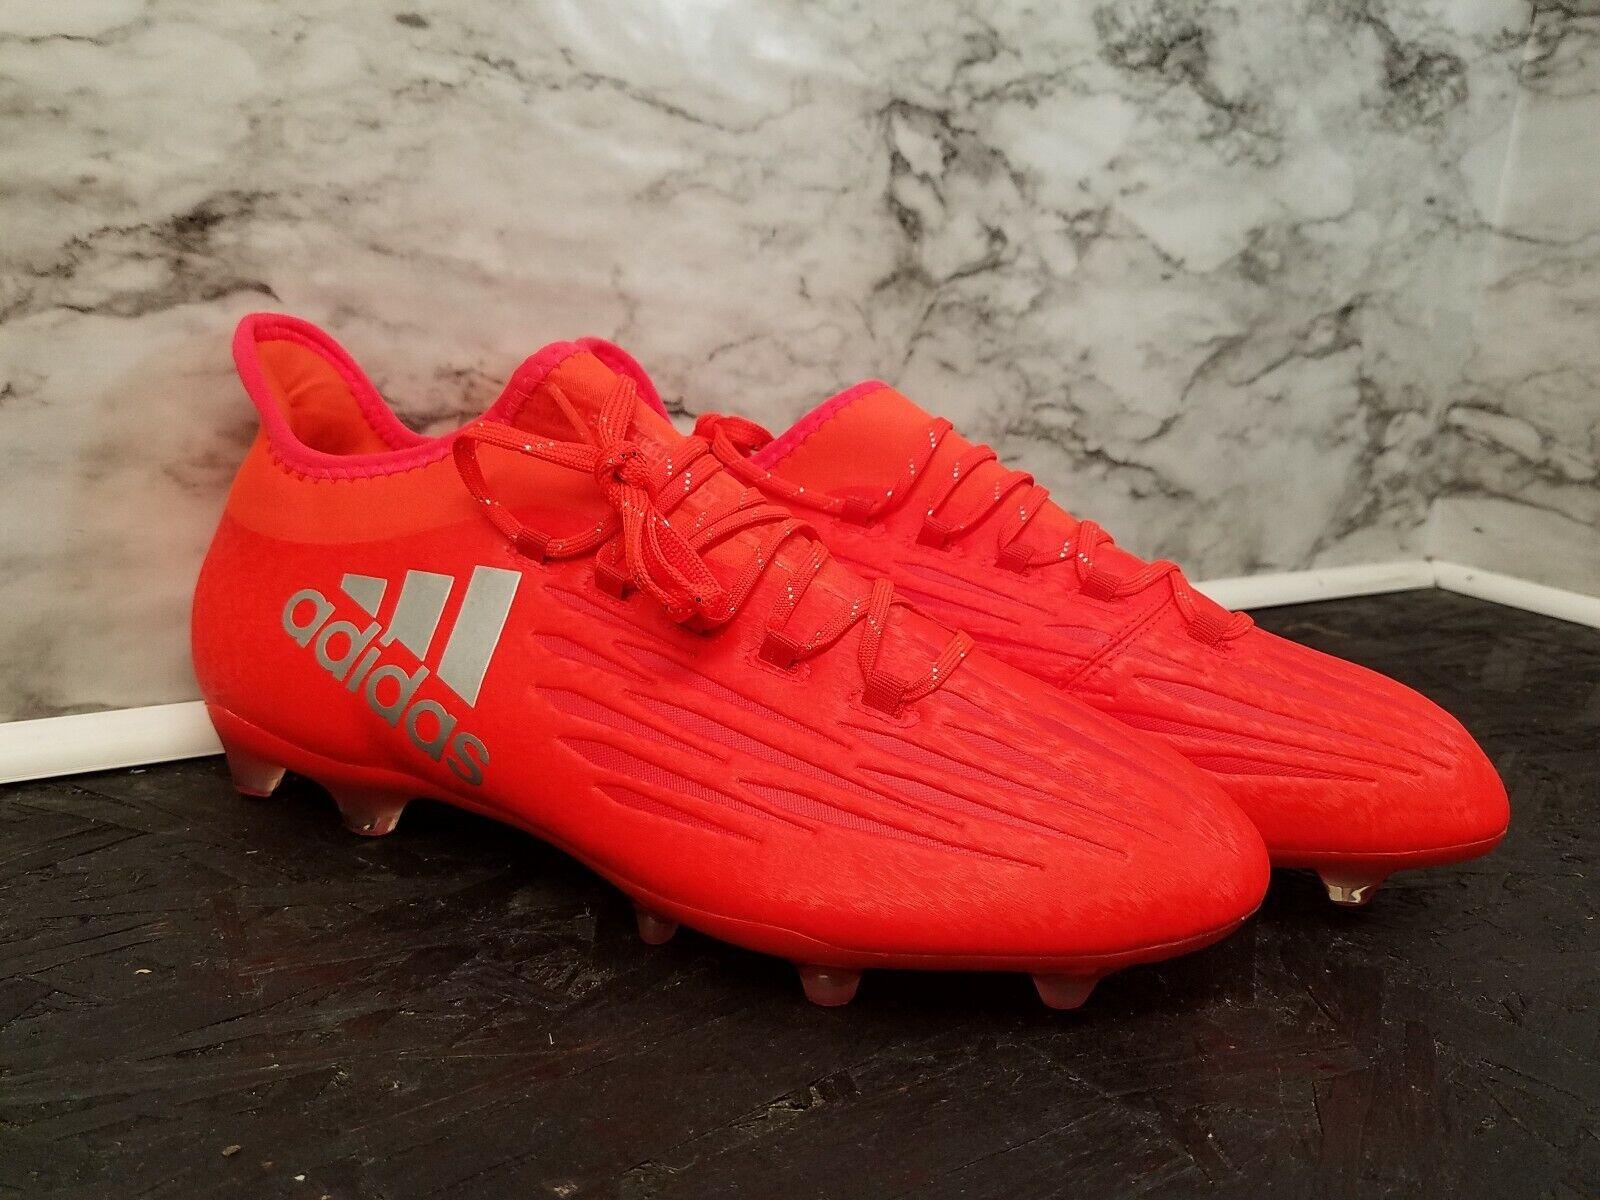 Adidas X 16.2 FG Tech Fit Soccer Cleats orange Men Sz 10.5 New Retail 150